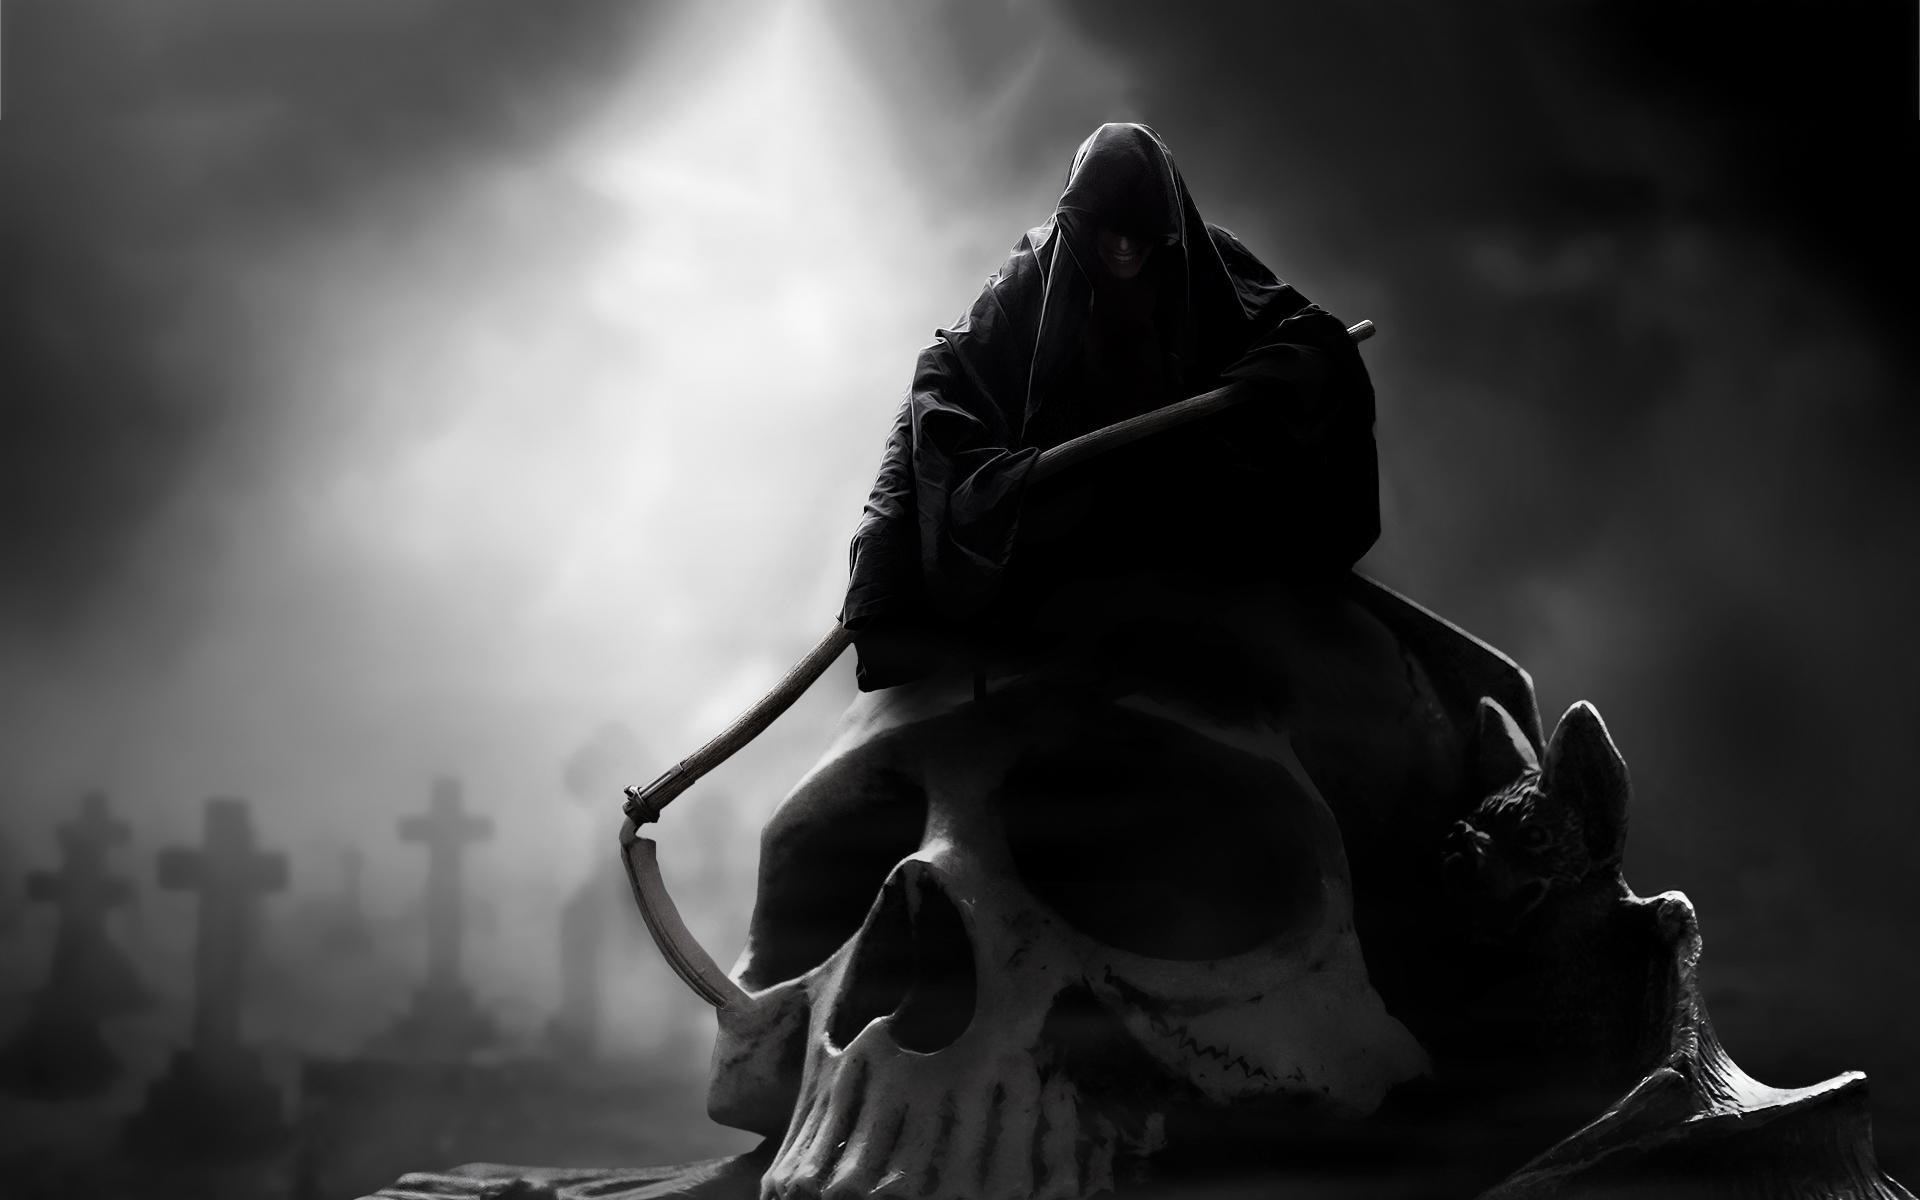 Skull grim reaper